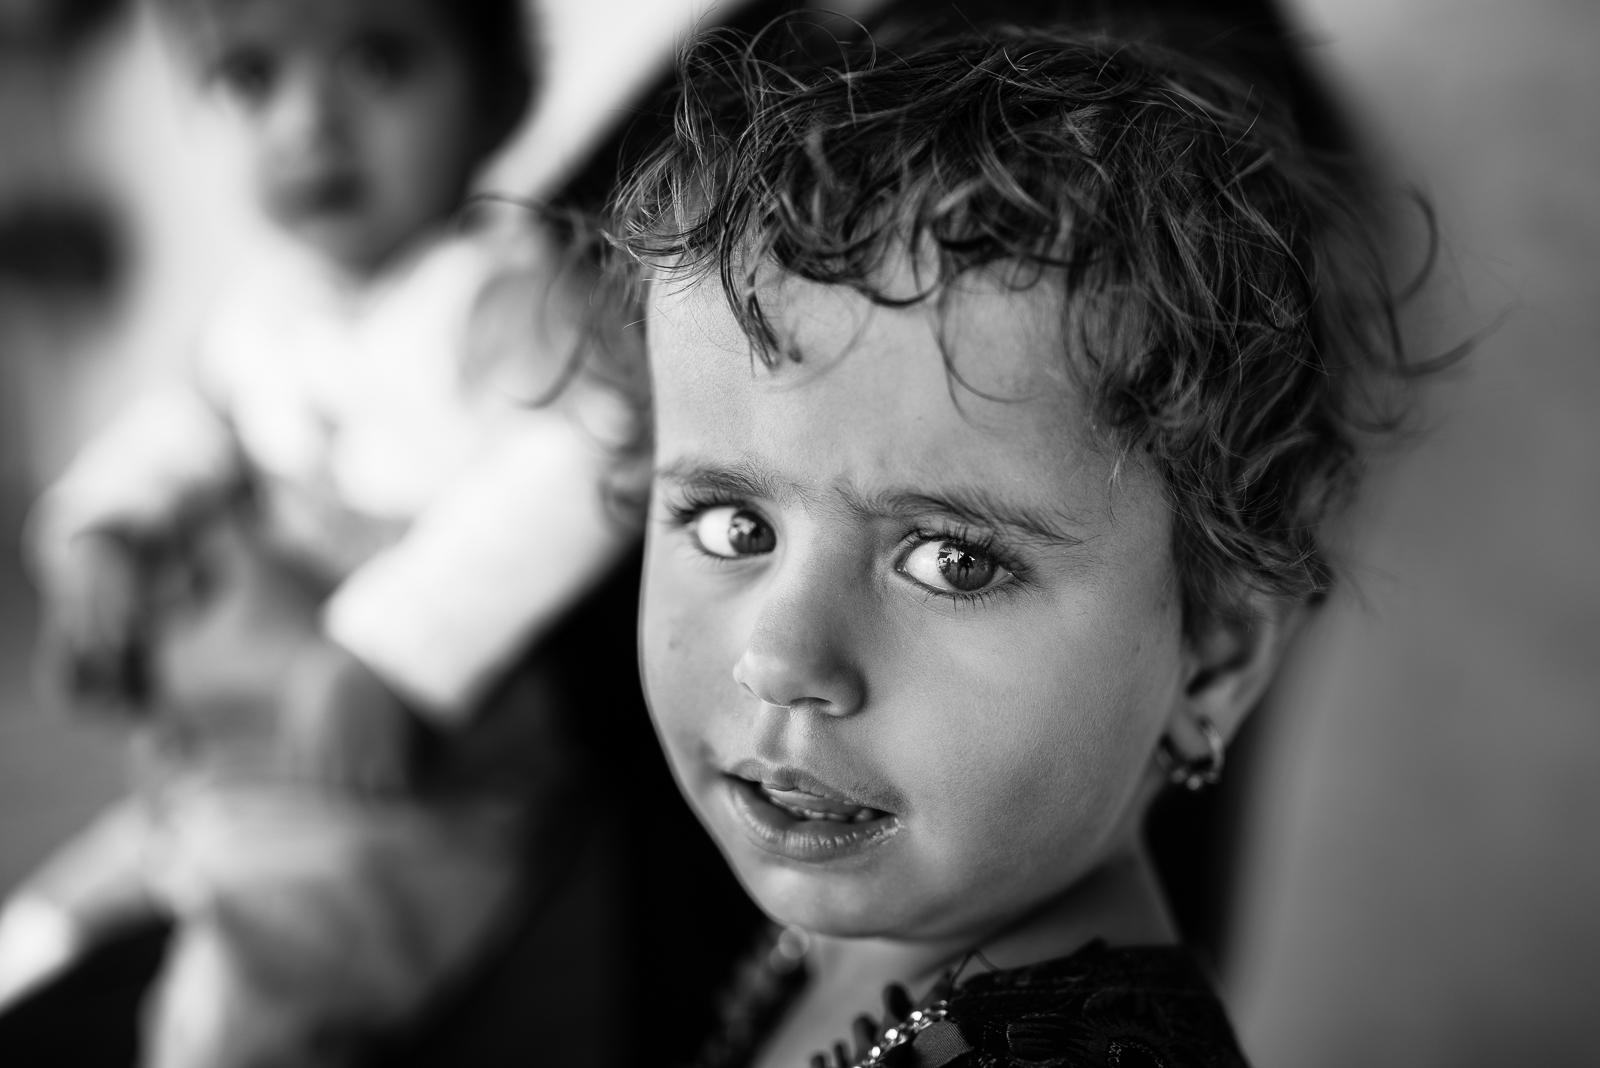 Little girl in aErbil's school